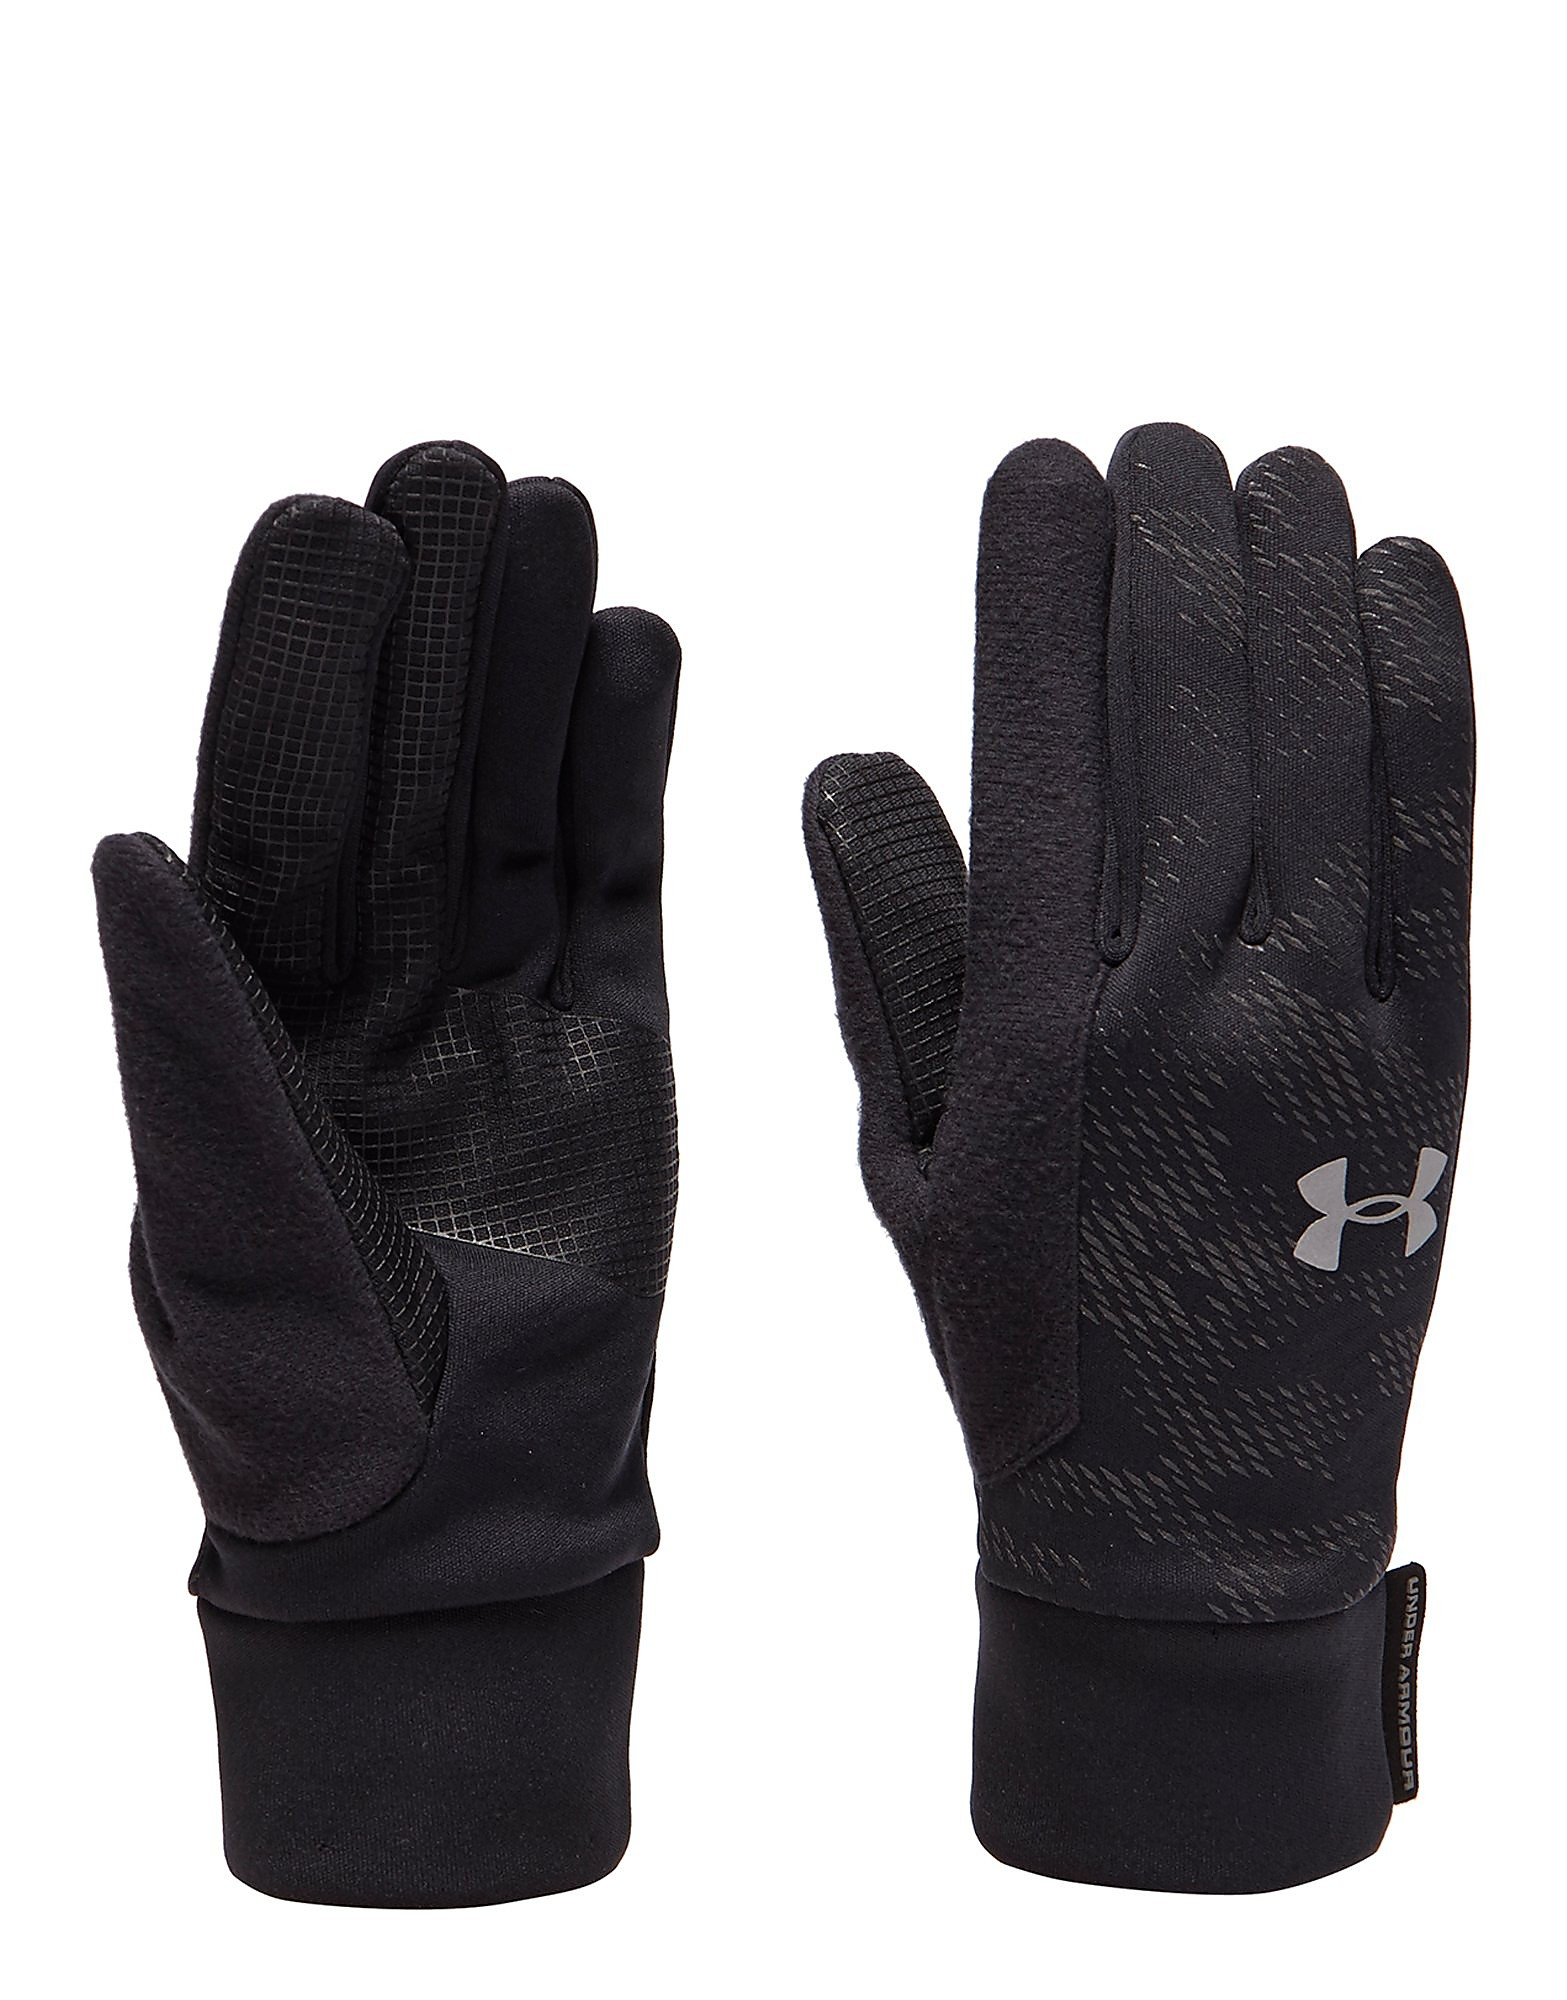 Under Armour NoBreaks ColdGear Infrared Liner Gloves